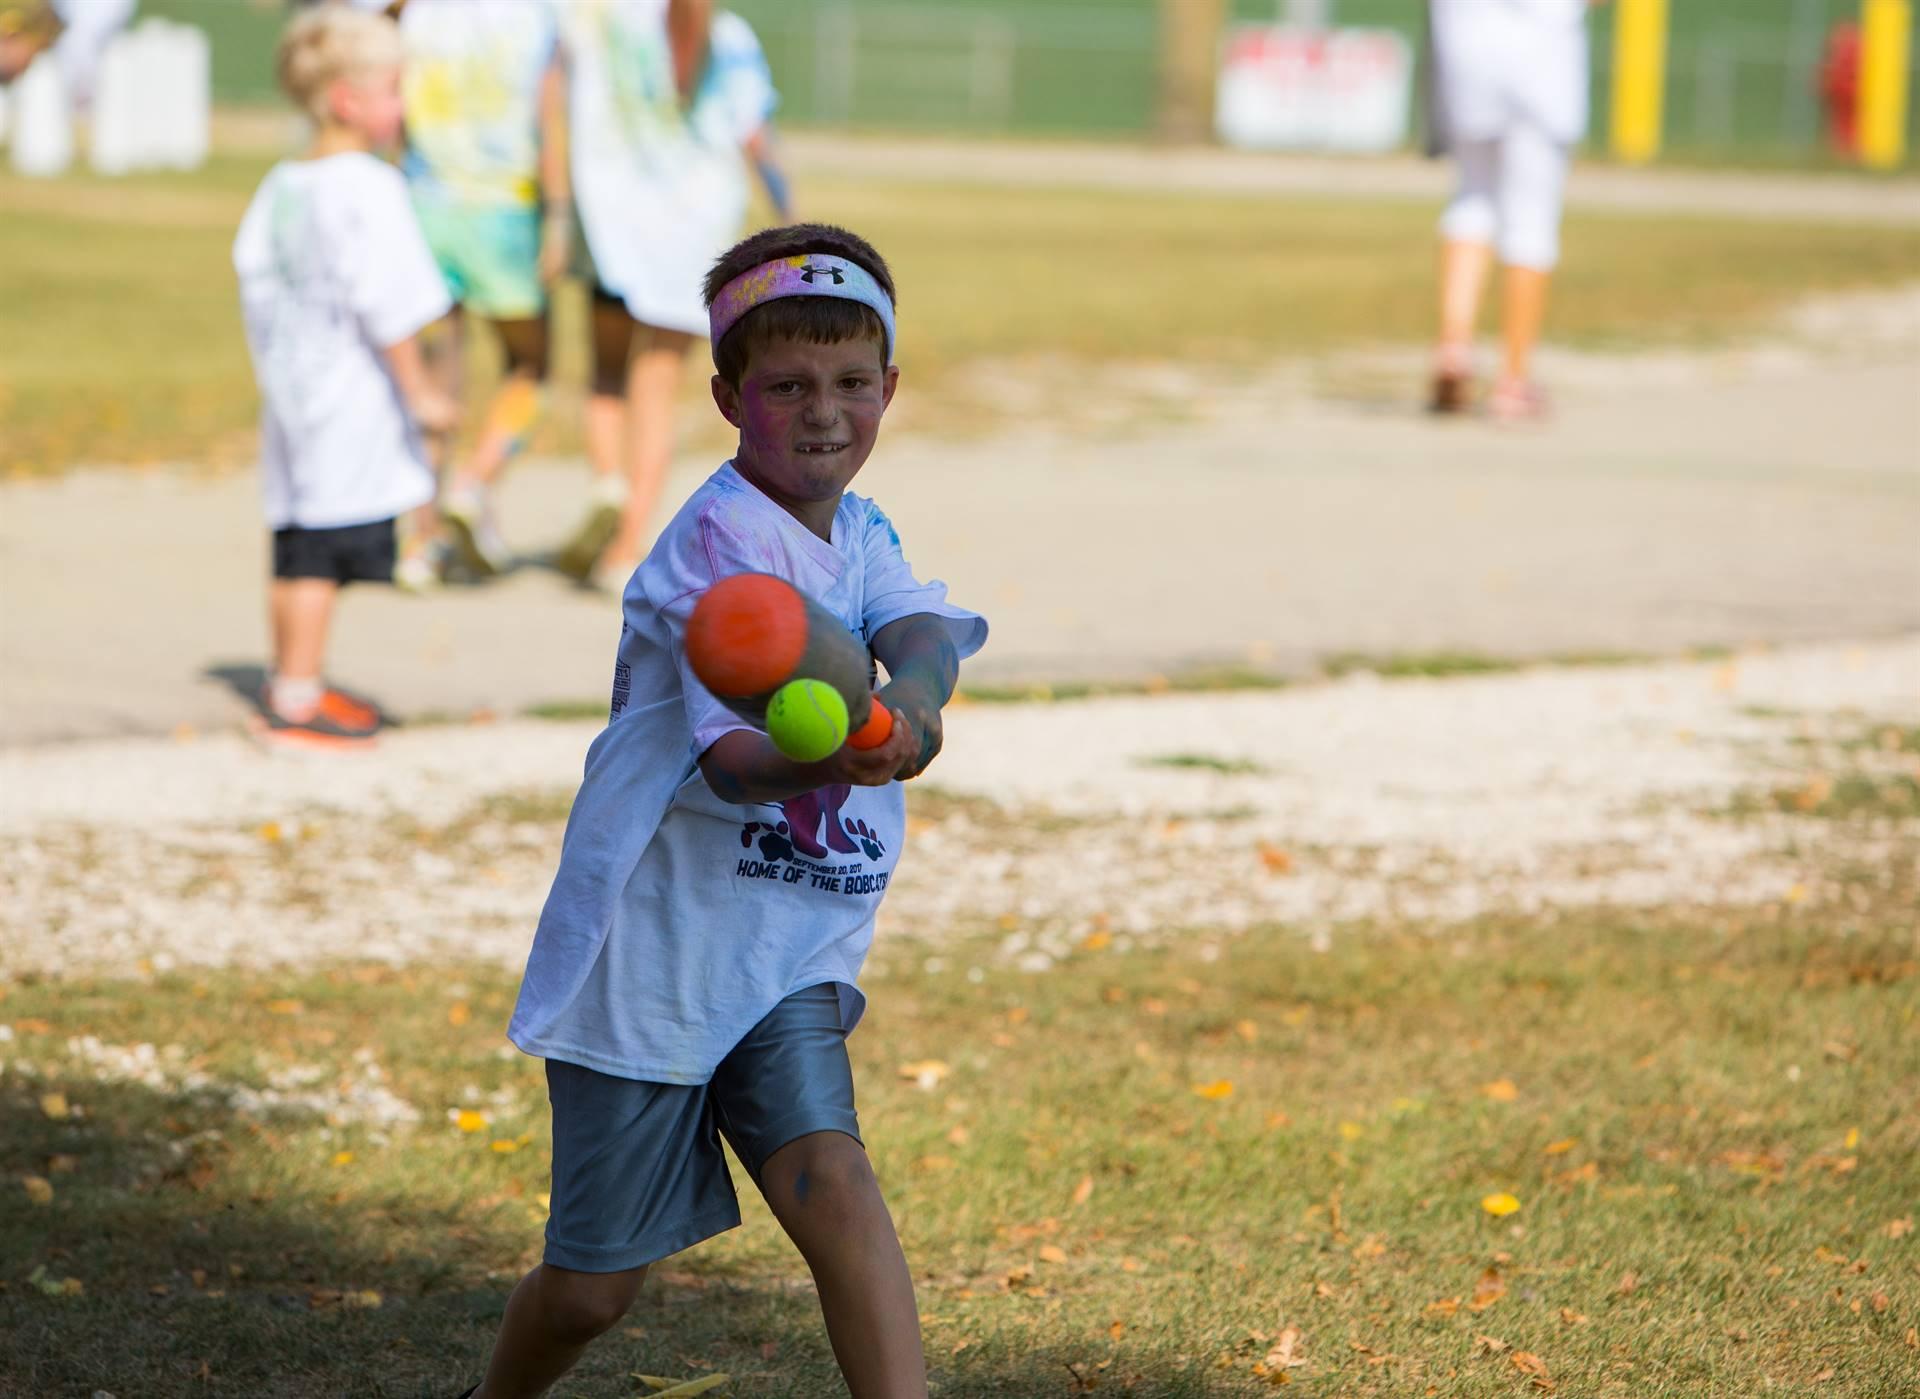 boy hitting ball with bat